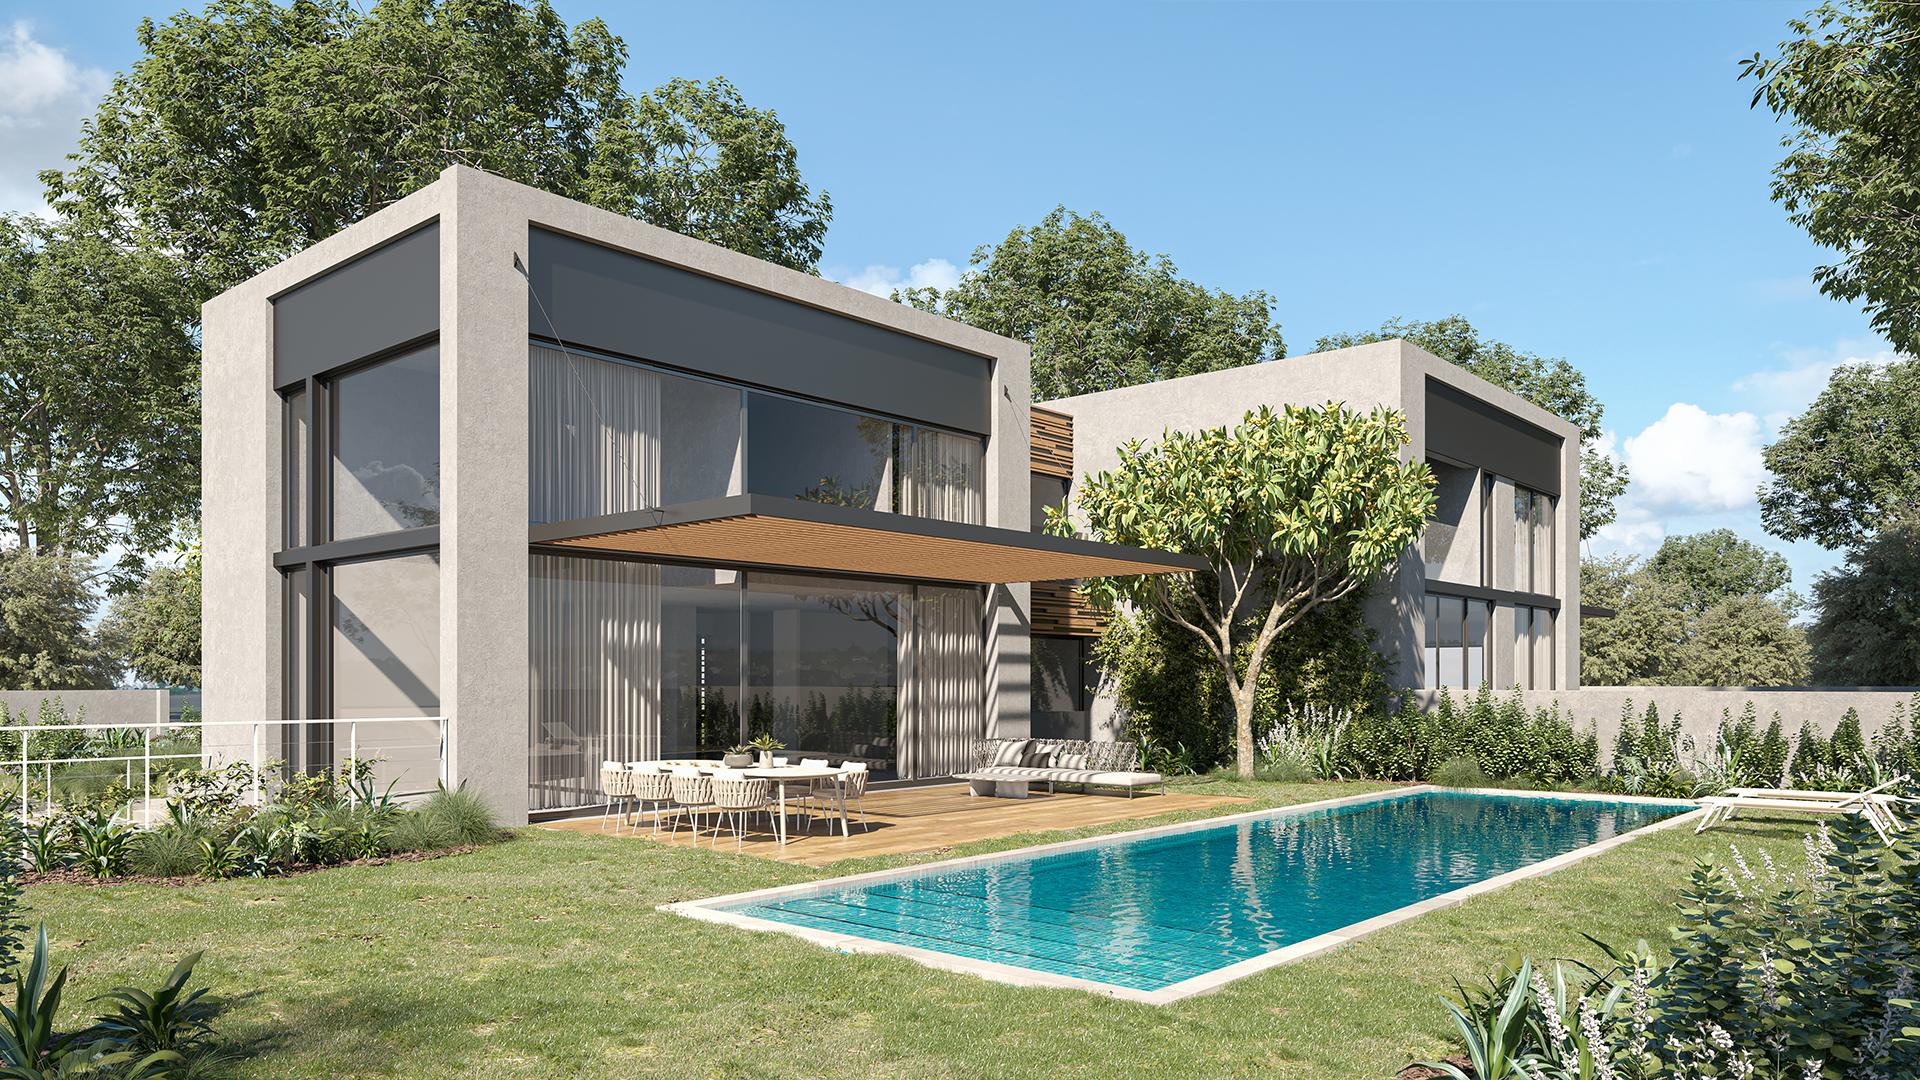 Maayan-Golan_Architectural-Visualization_exterior-visualization_back-elevation_tel-aviv_architecture-sade-dagan_02